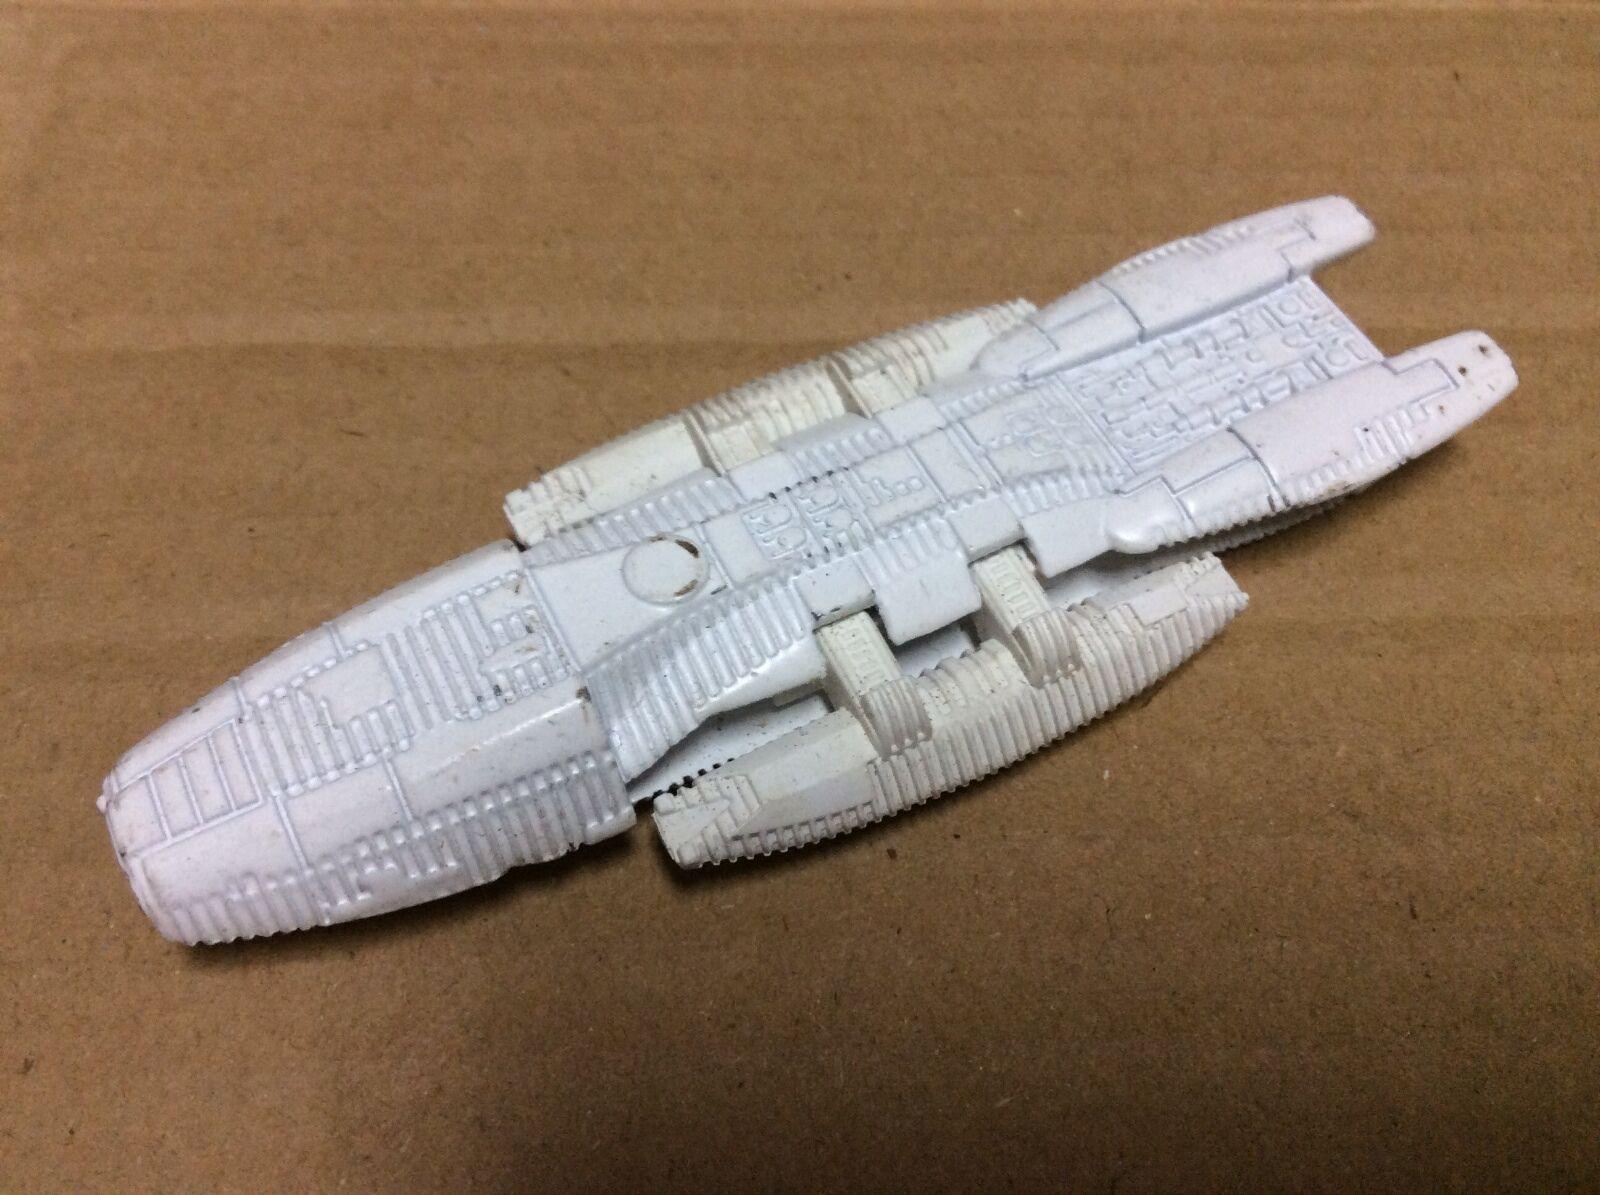 Hasbro Titanium Battlestar Galactica White Battleship predotype die die die cast Metal c54162